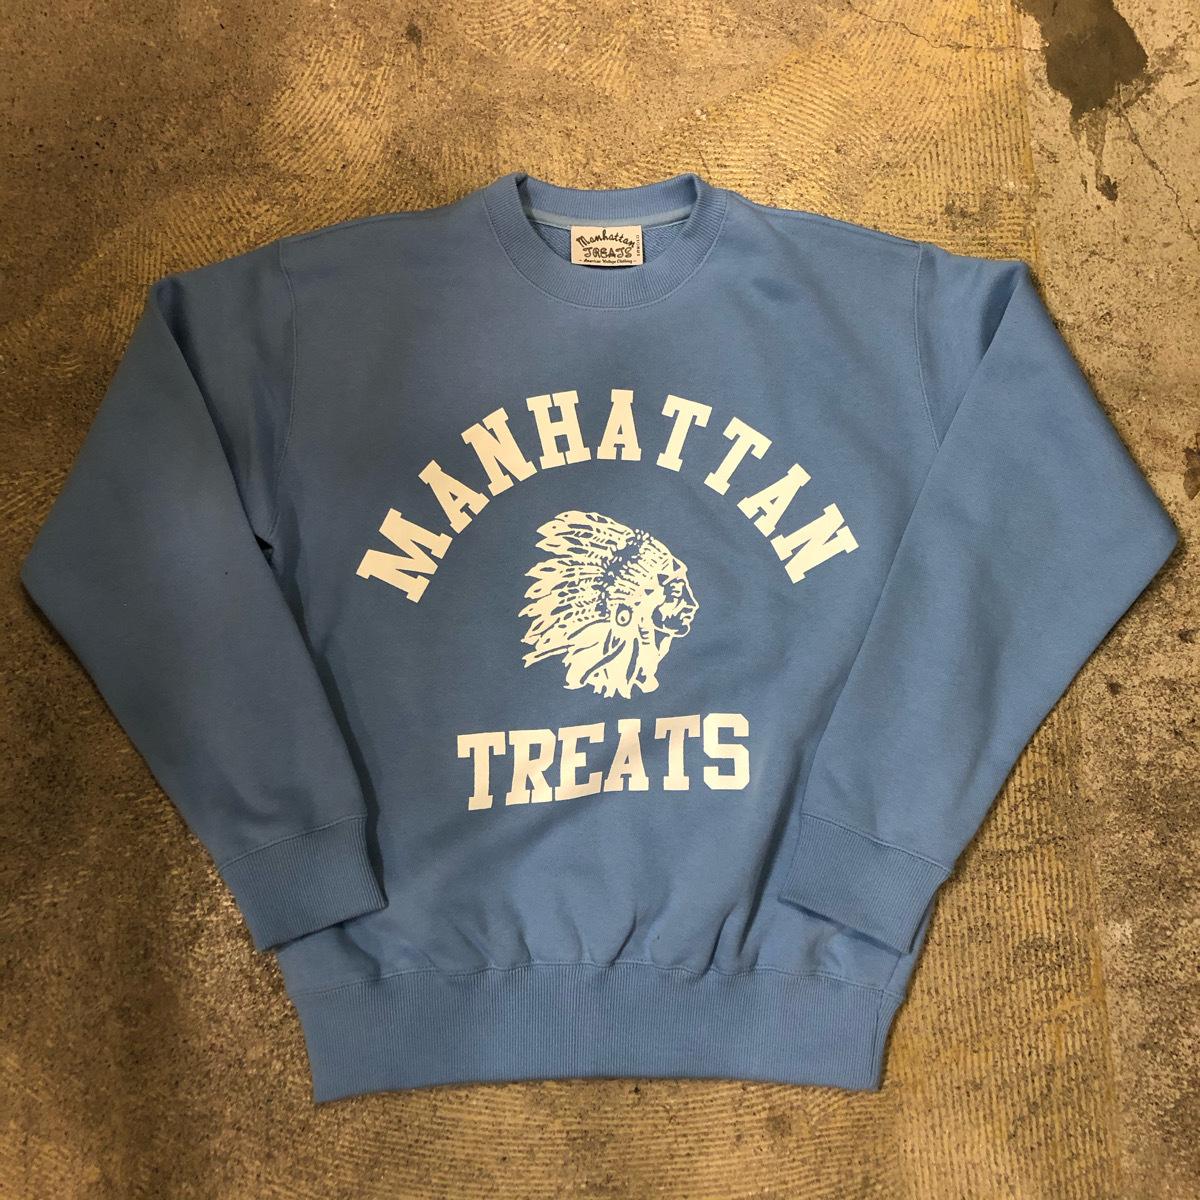 MANHATTAN TREATS #Indian Treats Sweat Shirt